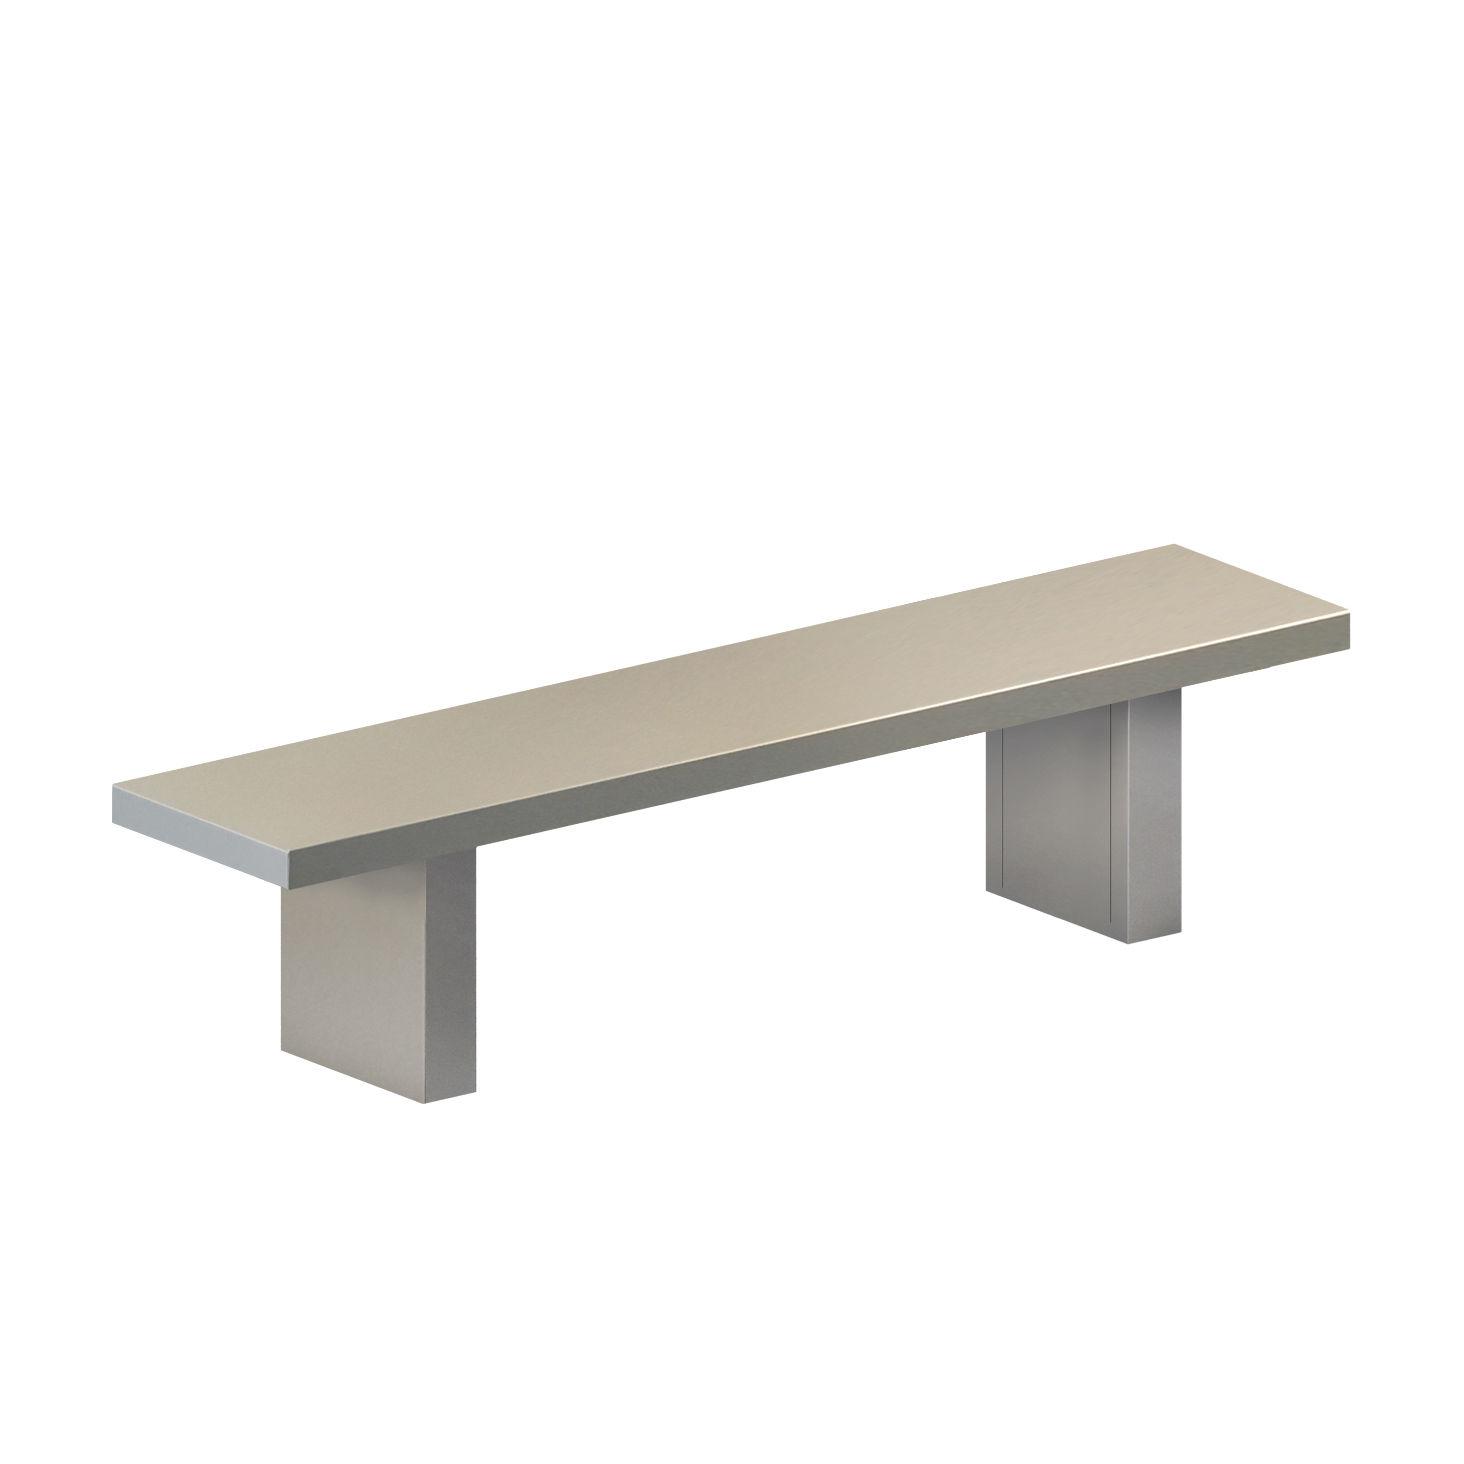 Möbel - Bänke - Tommaso OUTDOOR Bank / L 160 cm - Stahl lackiert - Zeus - L 160 cm / Zementgrau - Acier phosphaté peint